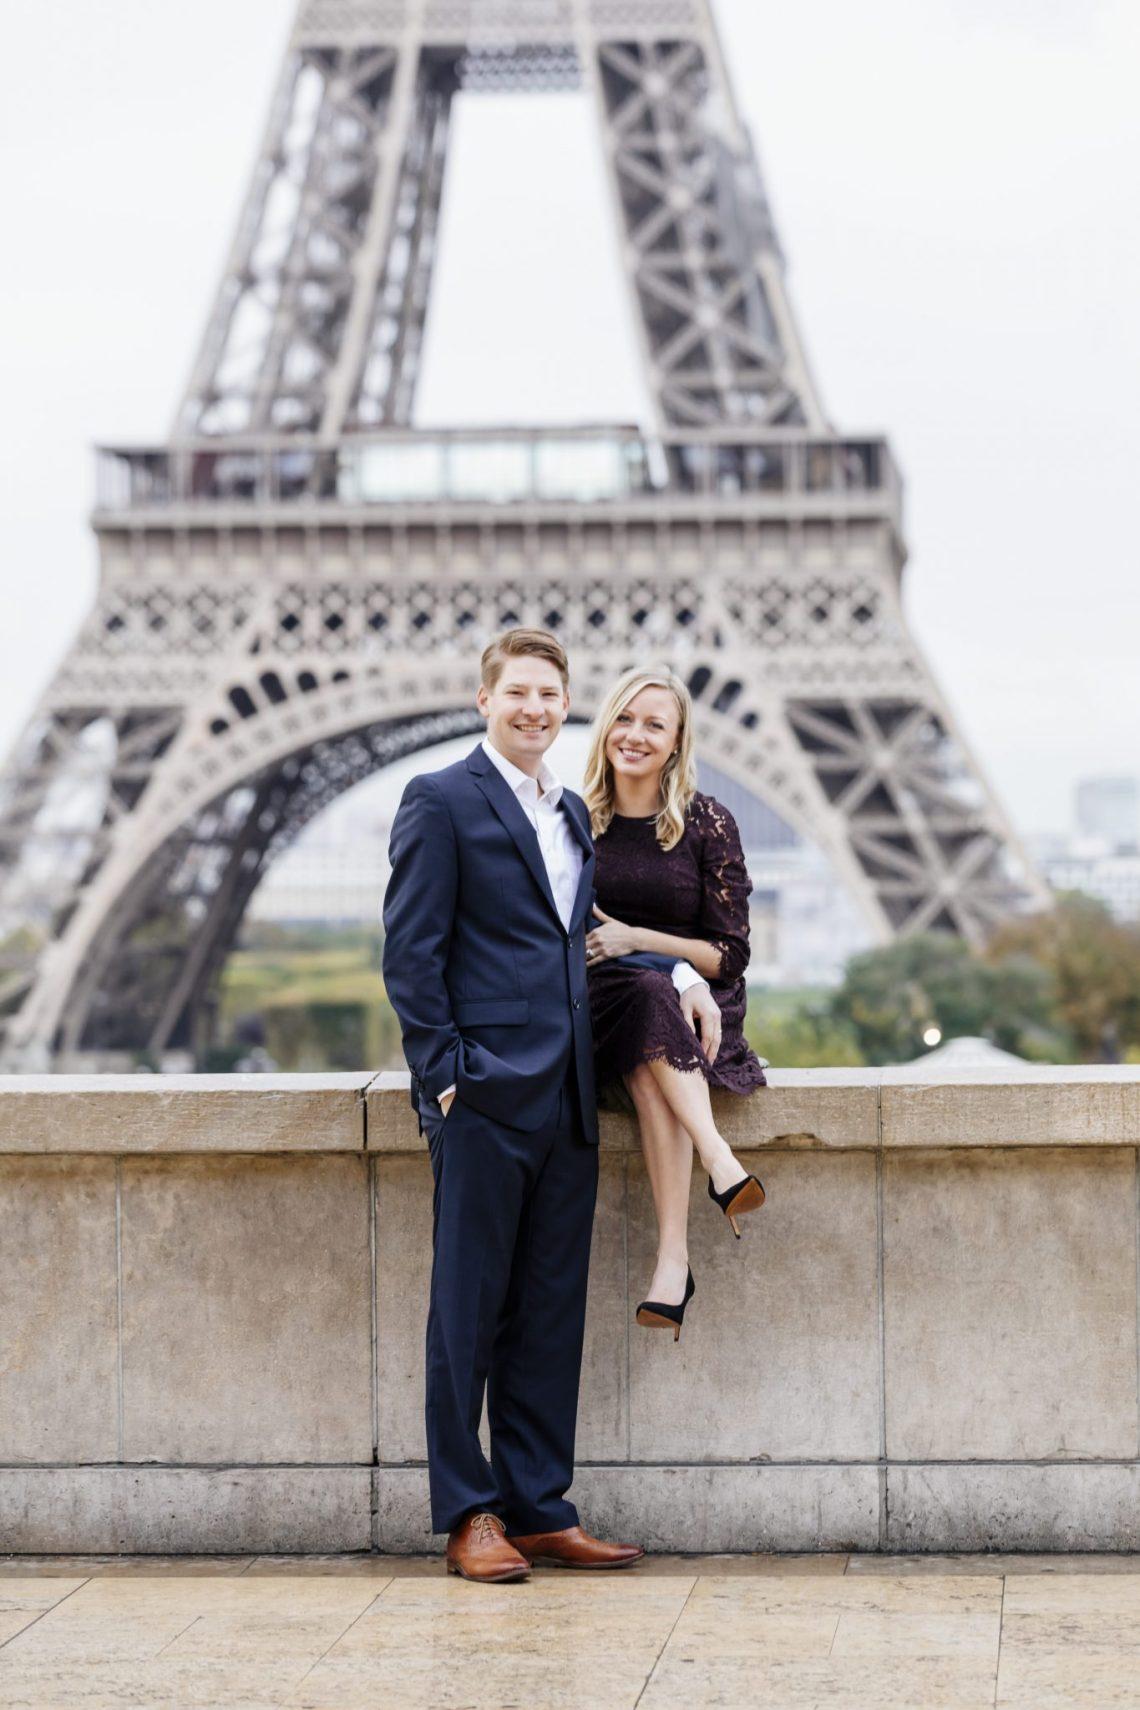 Fall in paris picture ideas